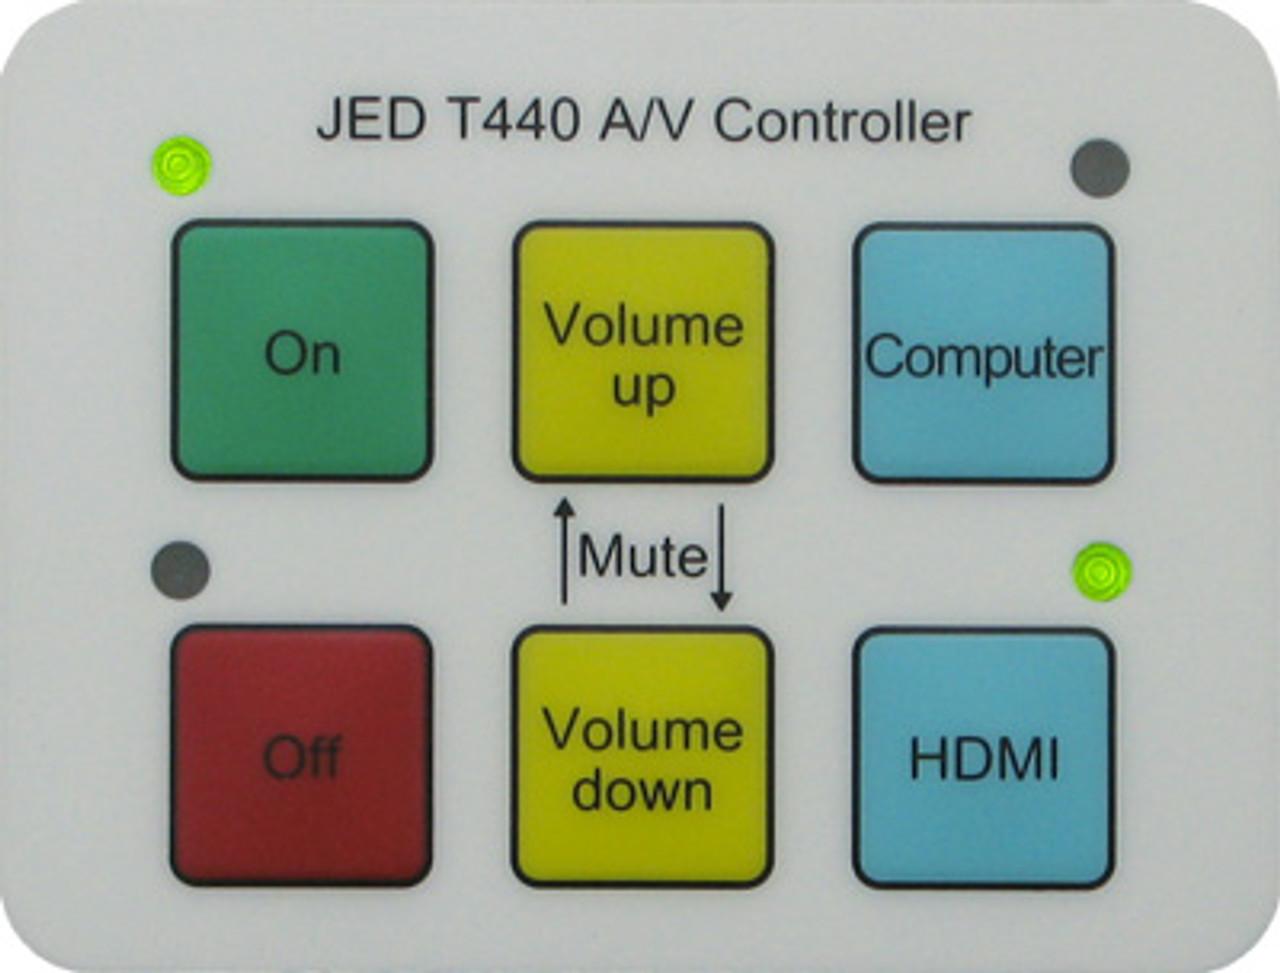 6-Key Code 9 + HDMI